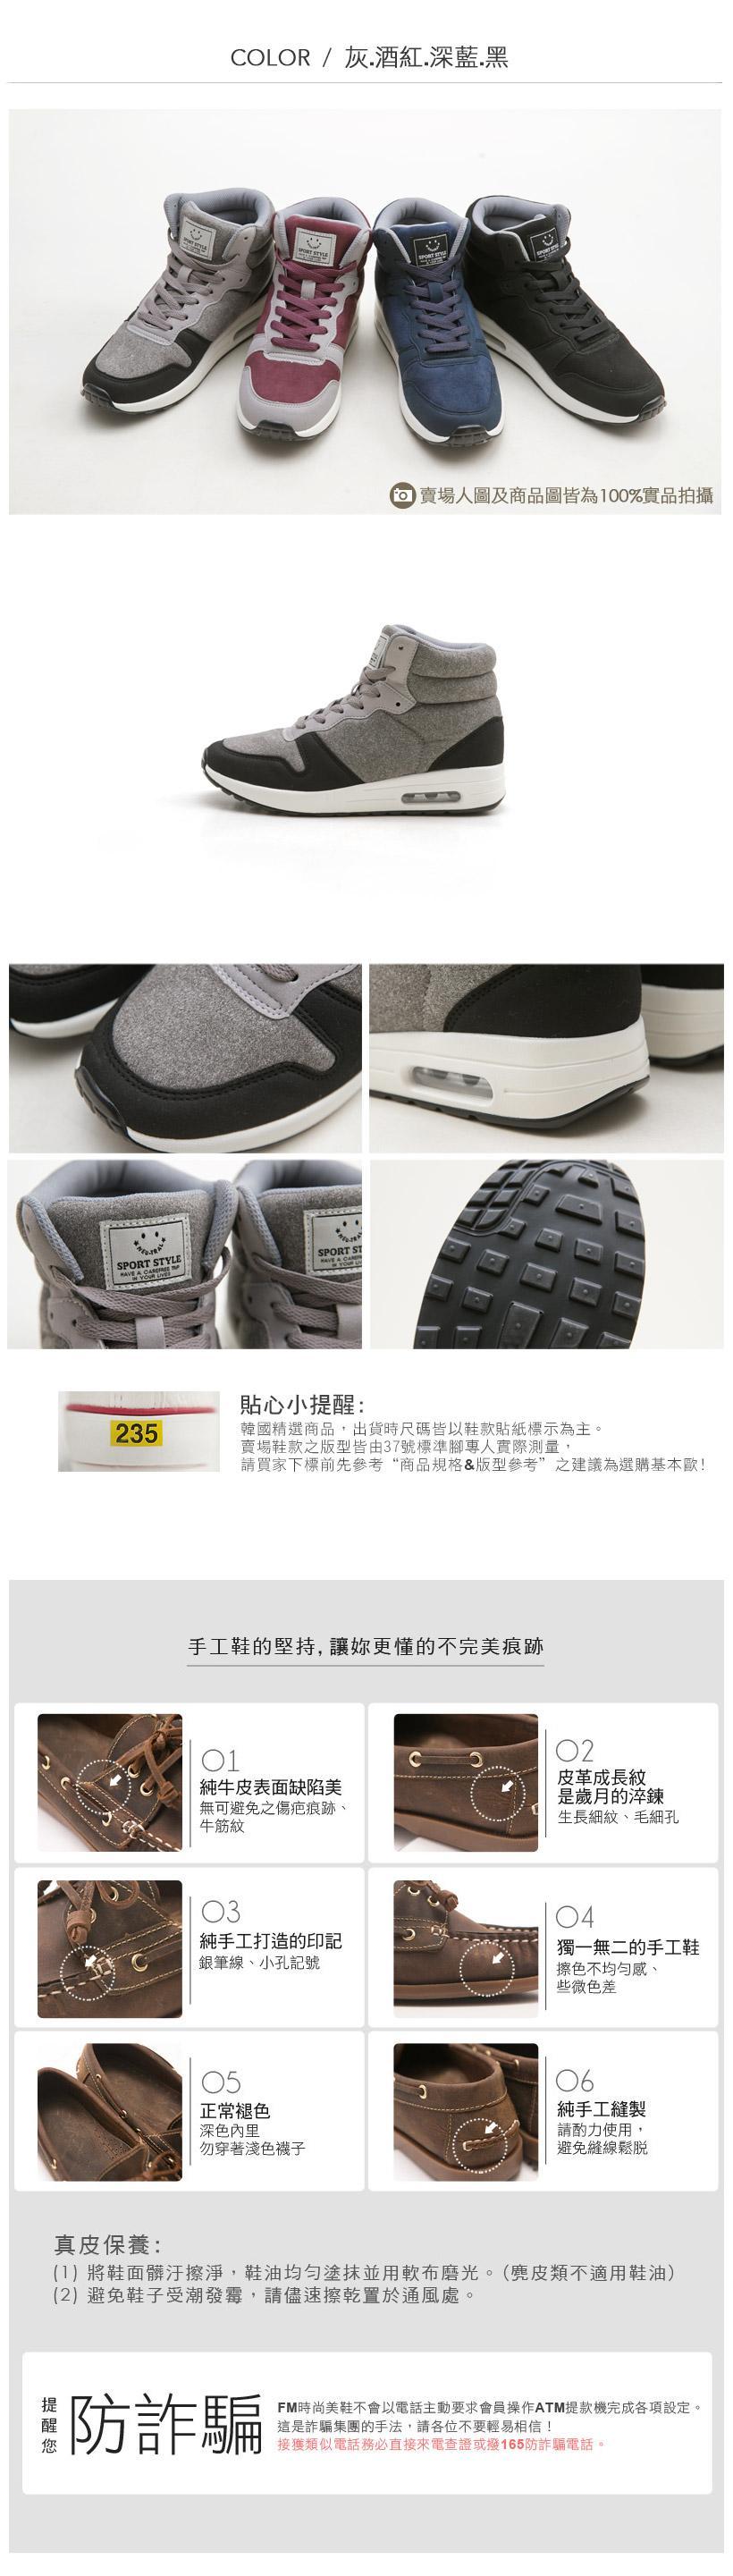 NeuTral-防潑水撞色內增高氣墊鞋(深藍)-大尺碼